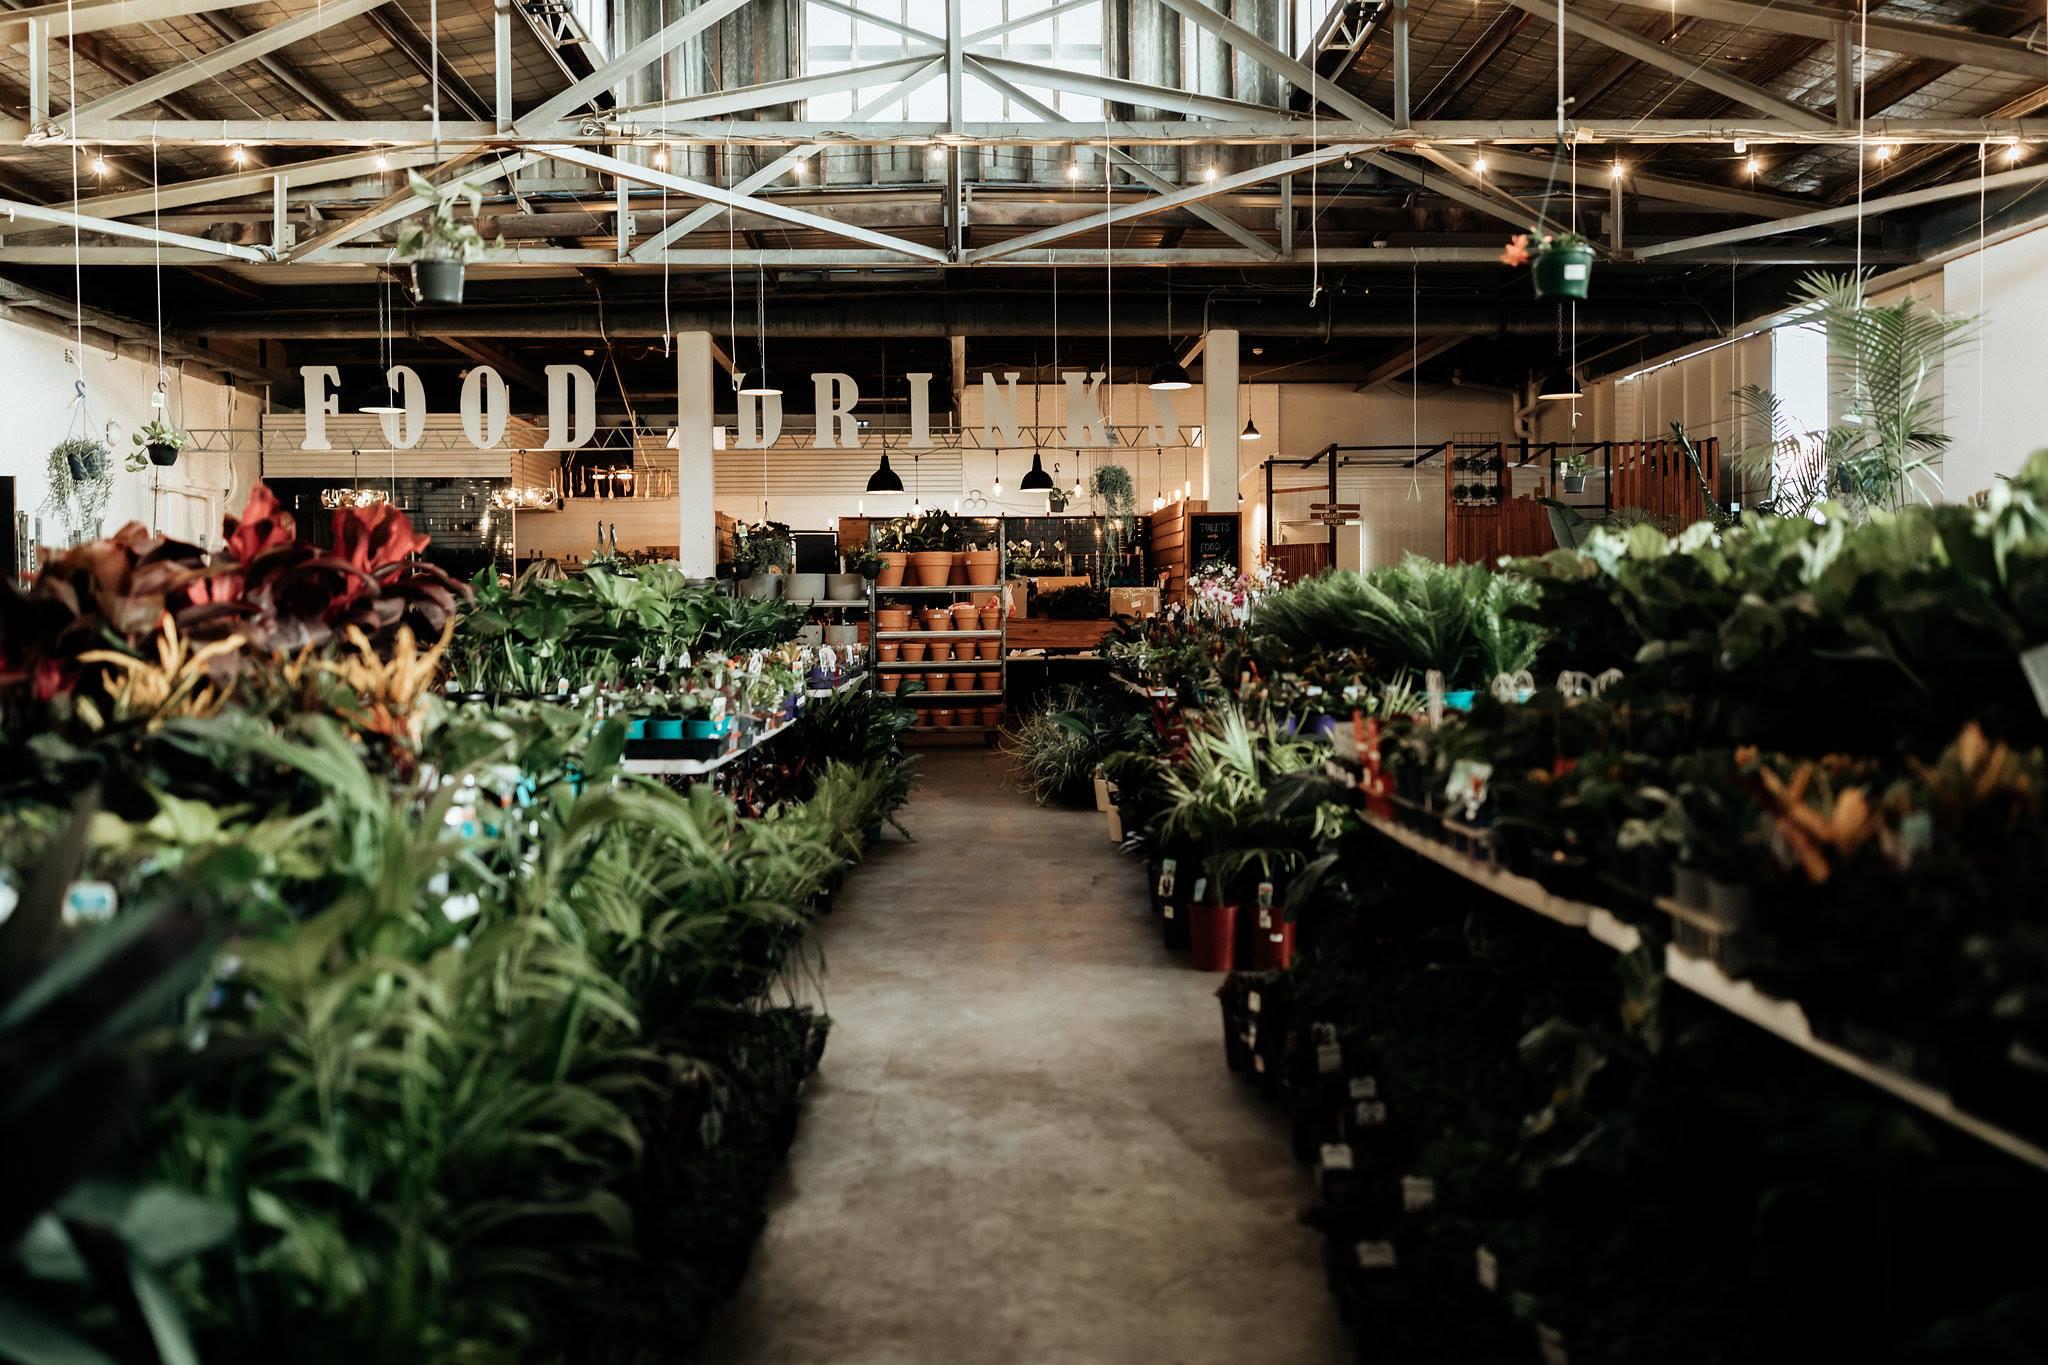 Huge Indoor Plant Warehouse Sale- Summertime Madness - Perth, Perth, Western Australia, Australia